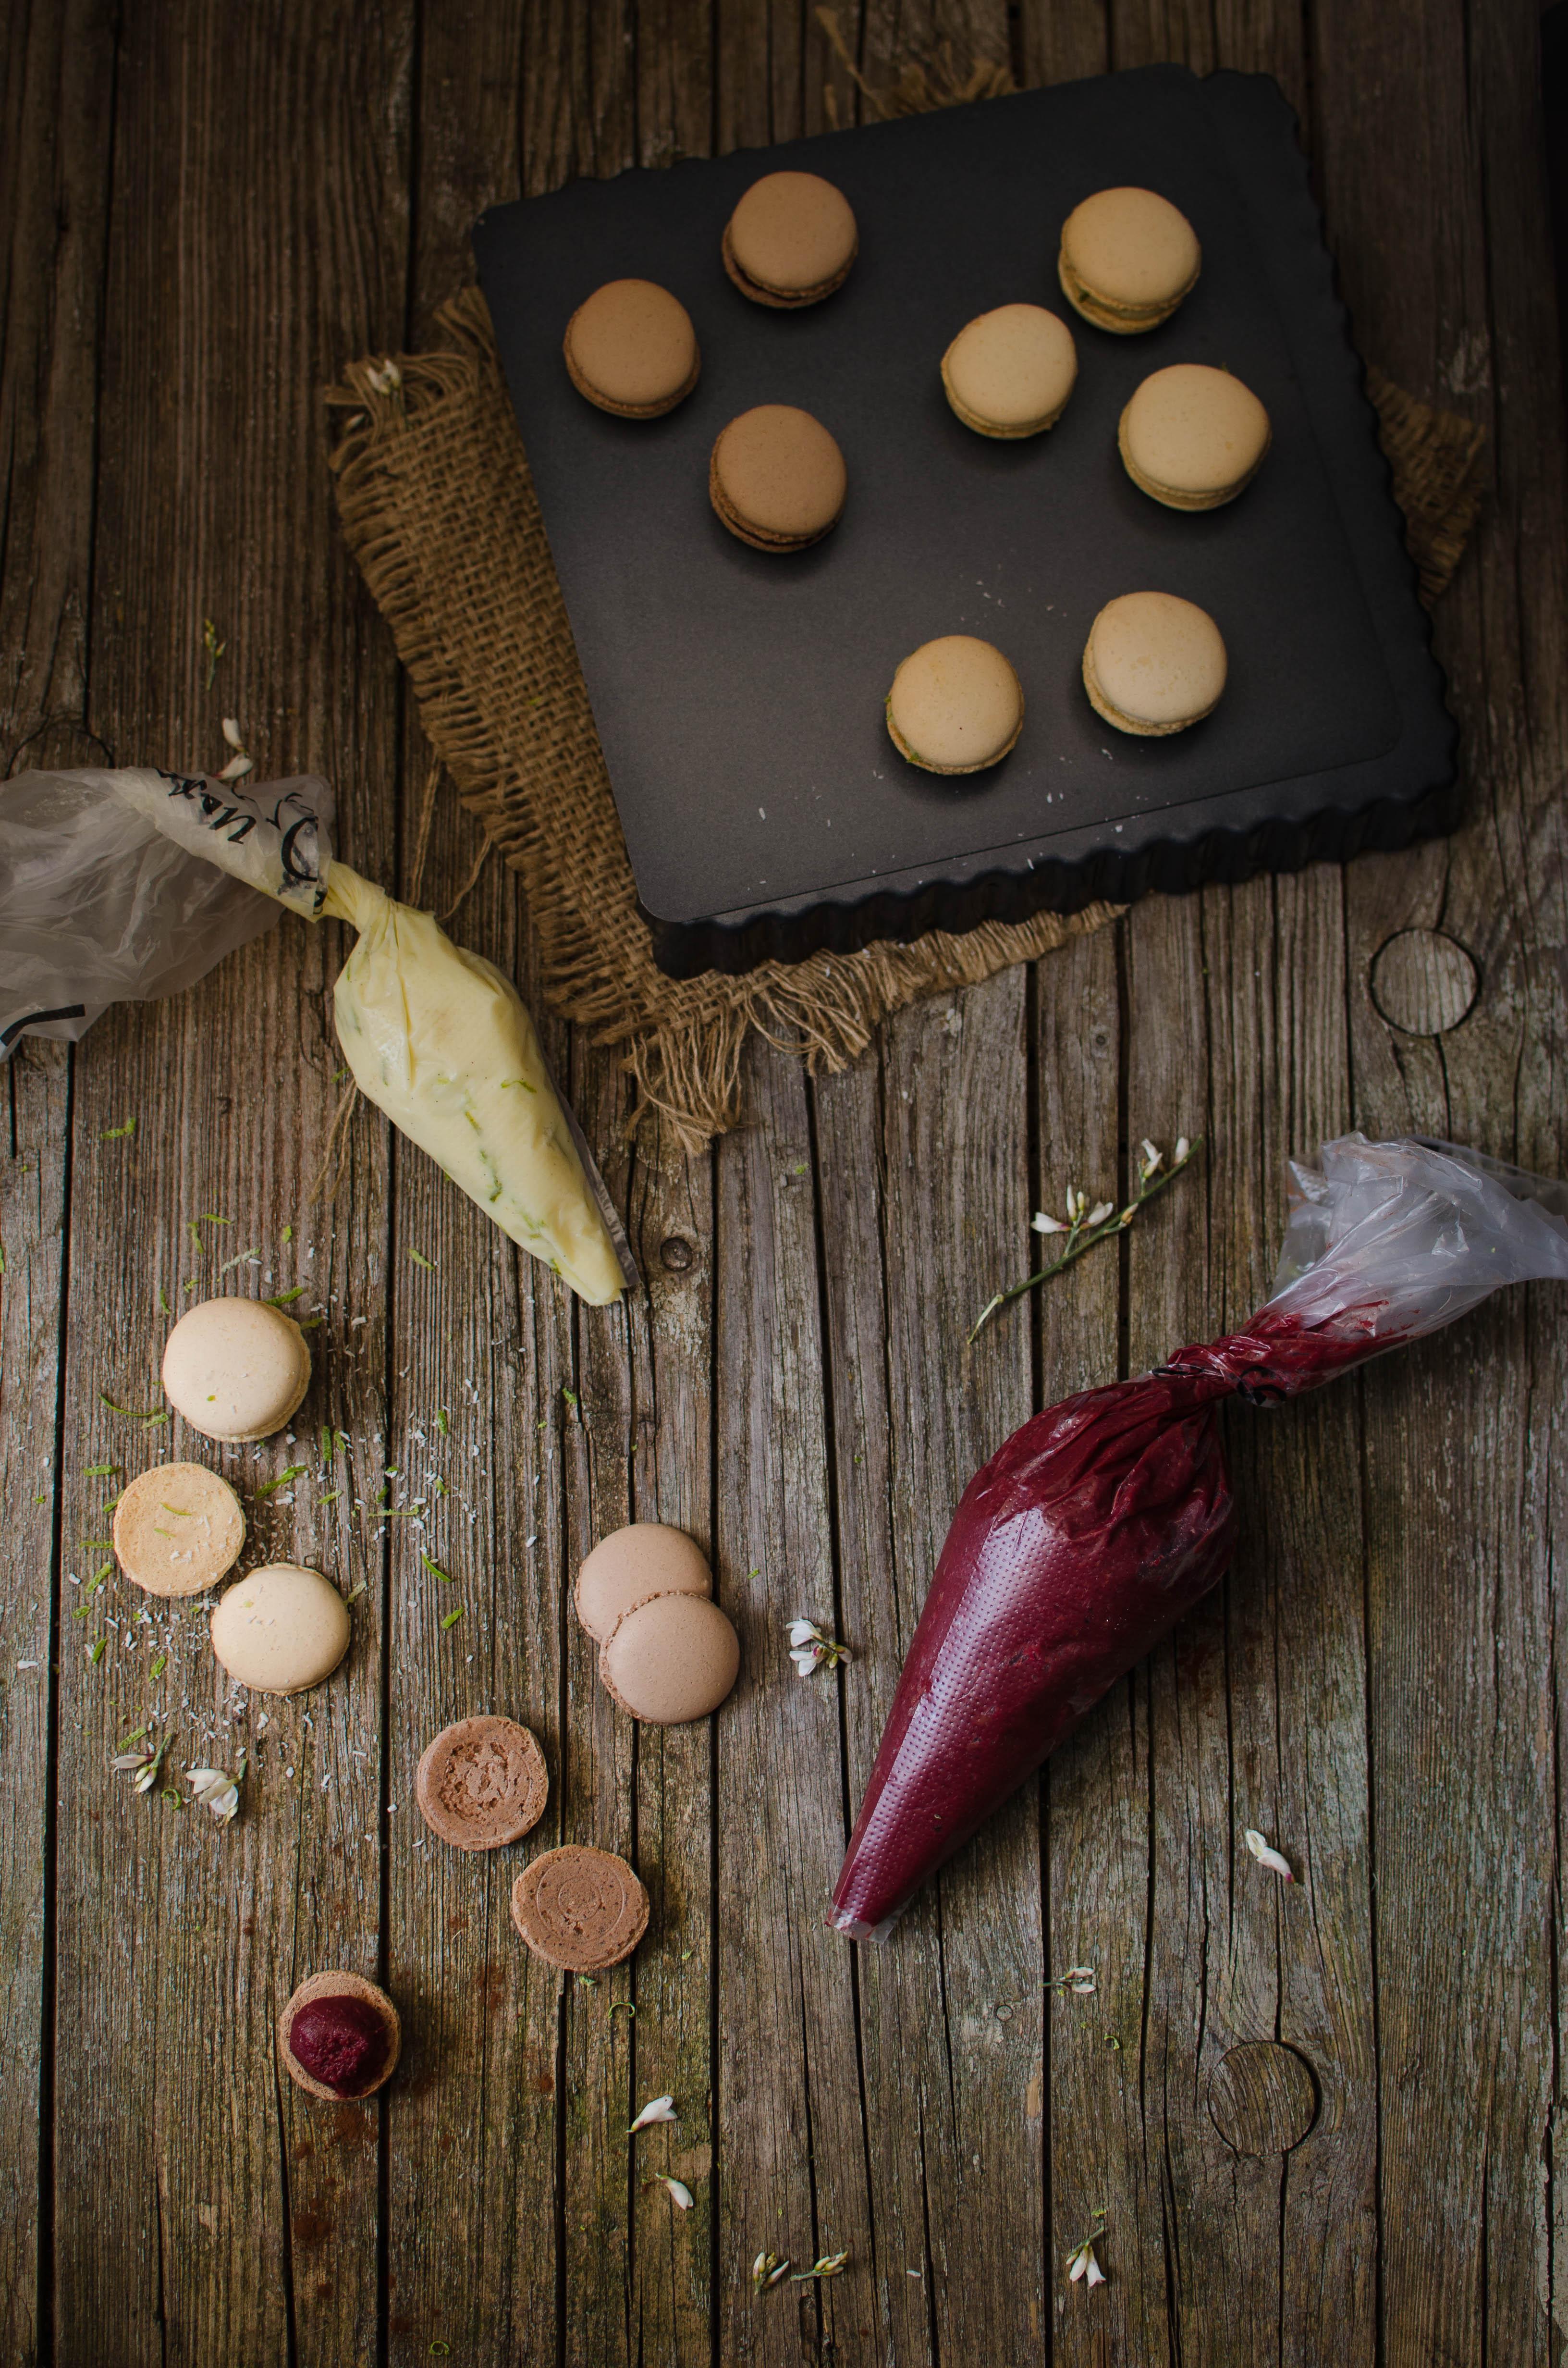 macarons_mtch3 Macarons al cioccolato con barbabietola, lime, cocco, arancia